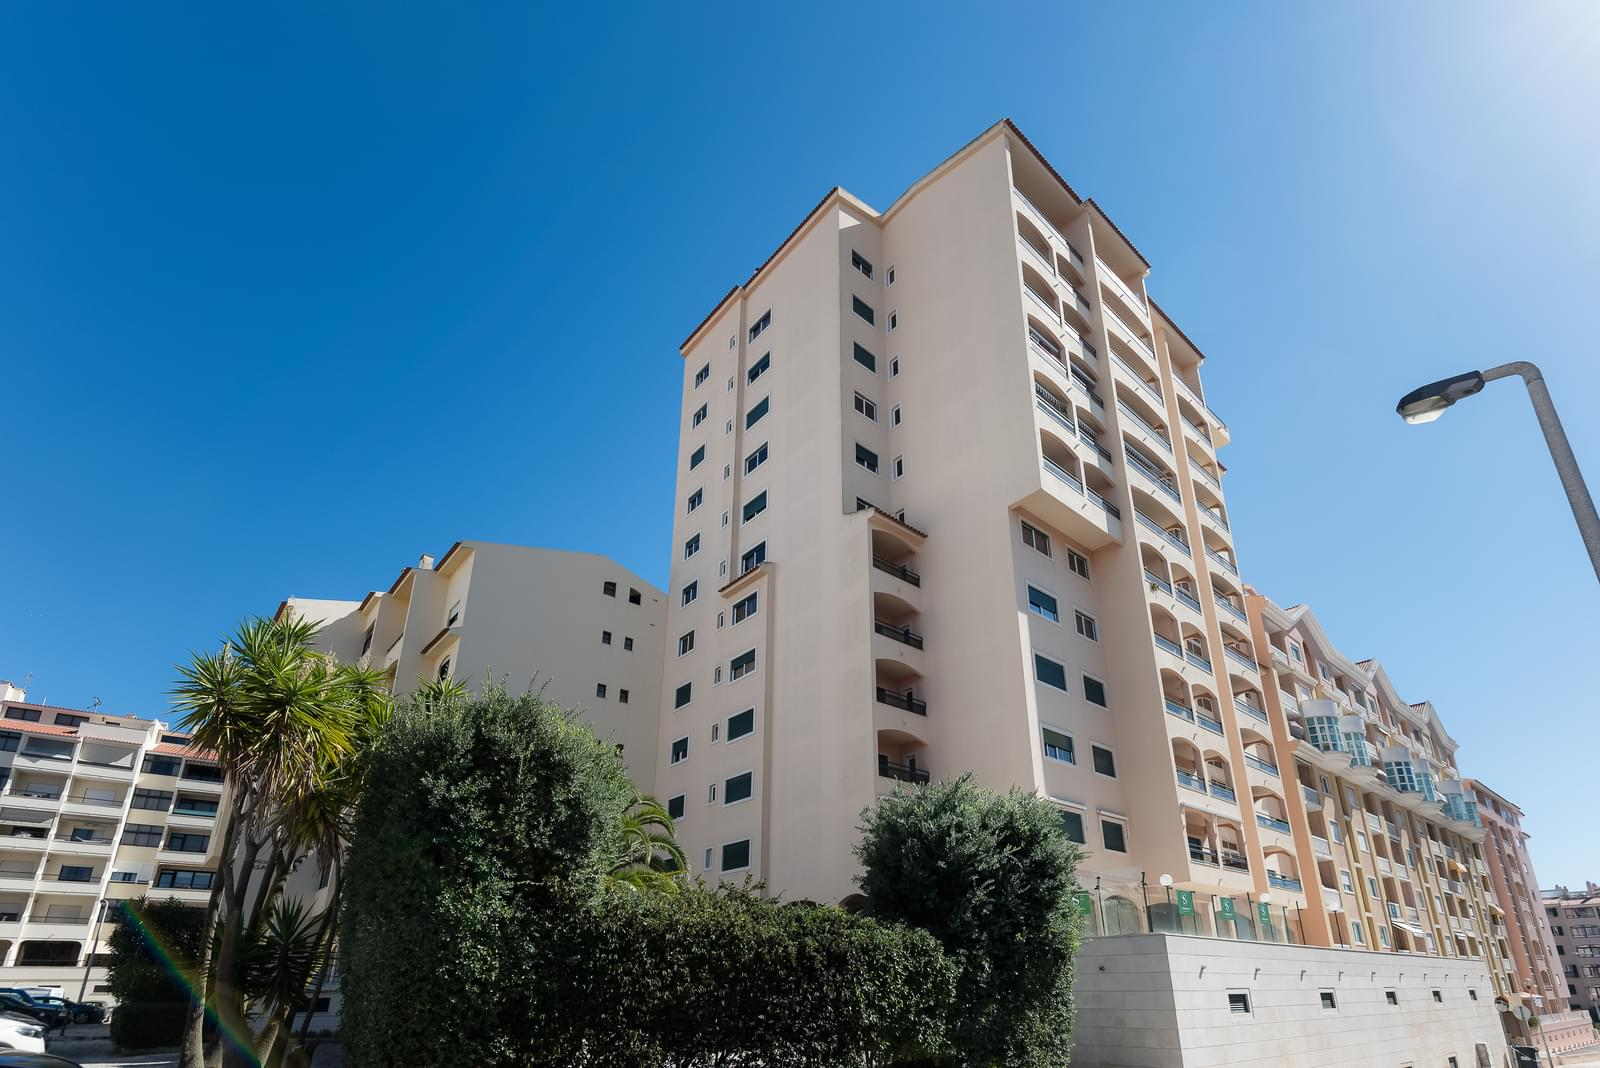 pf18286-apartamento-t2-cascais-f1b6b889-480e-4c22-81b8-e34b106694c6